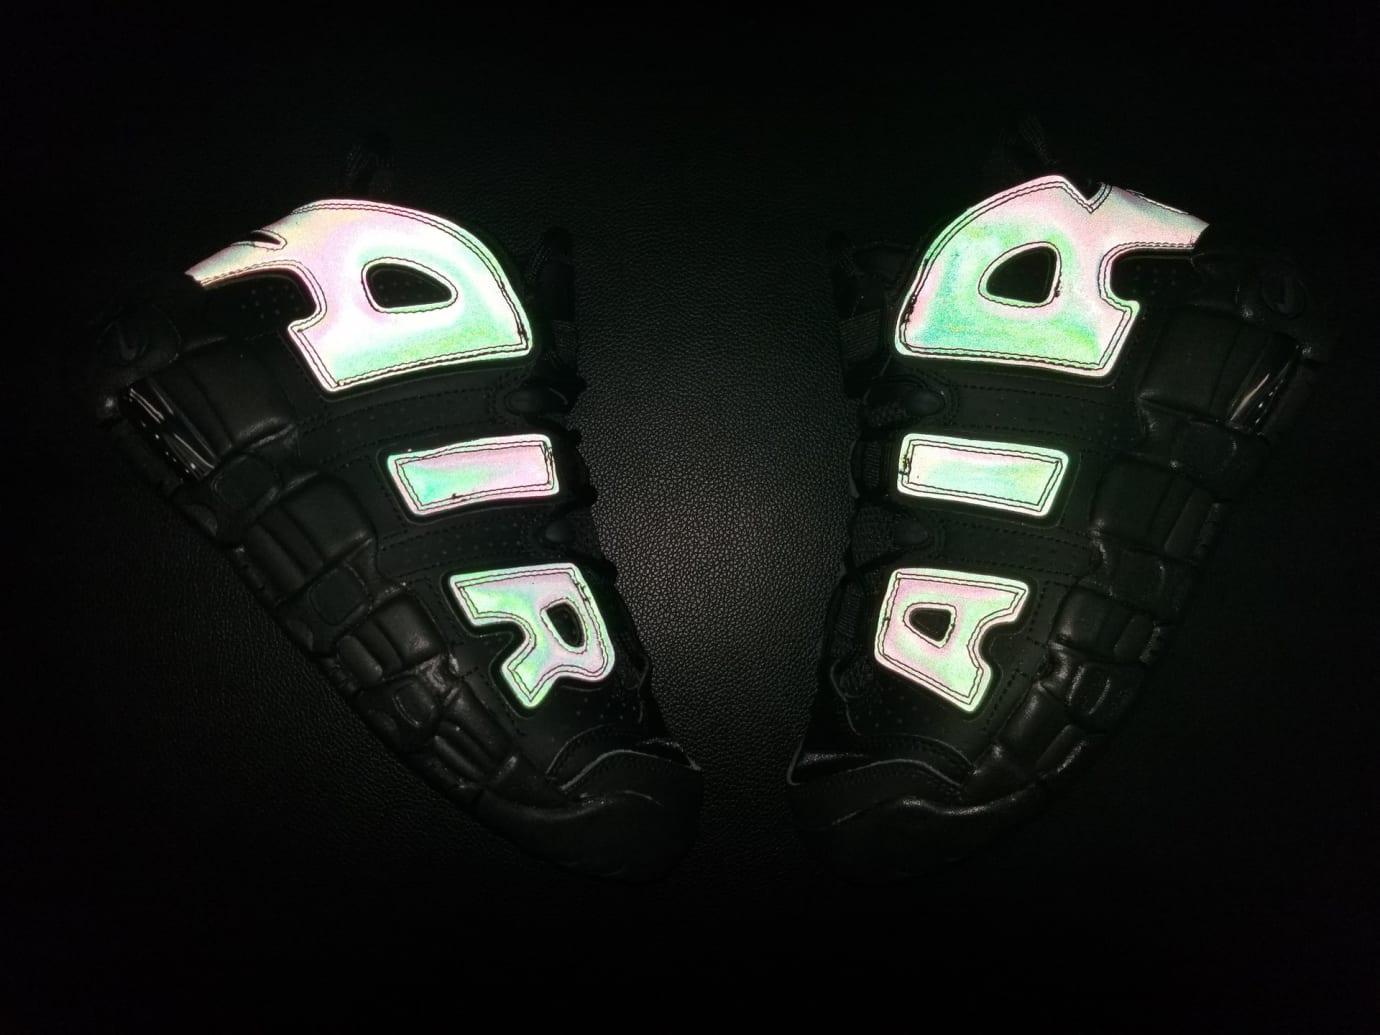 Nike Air More Uptempo GS 'Reflective' 922845-001 (Reflective)